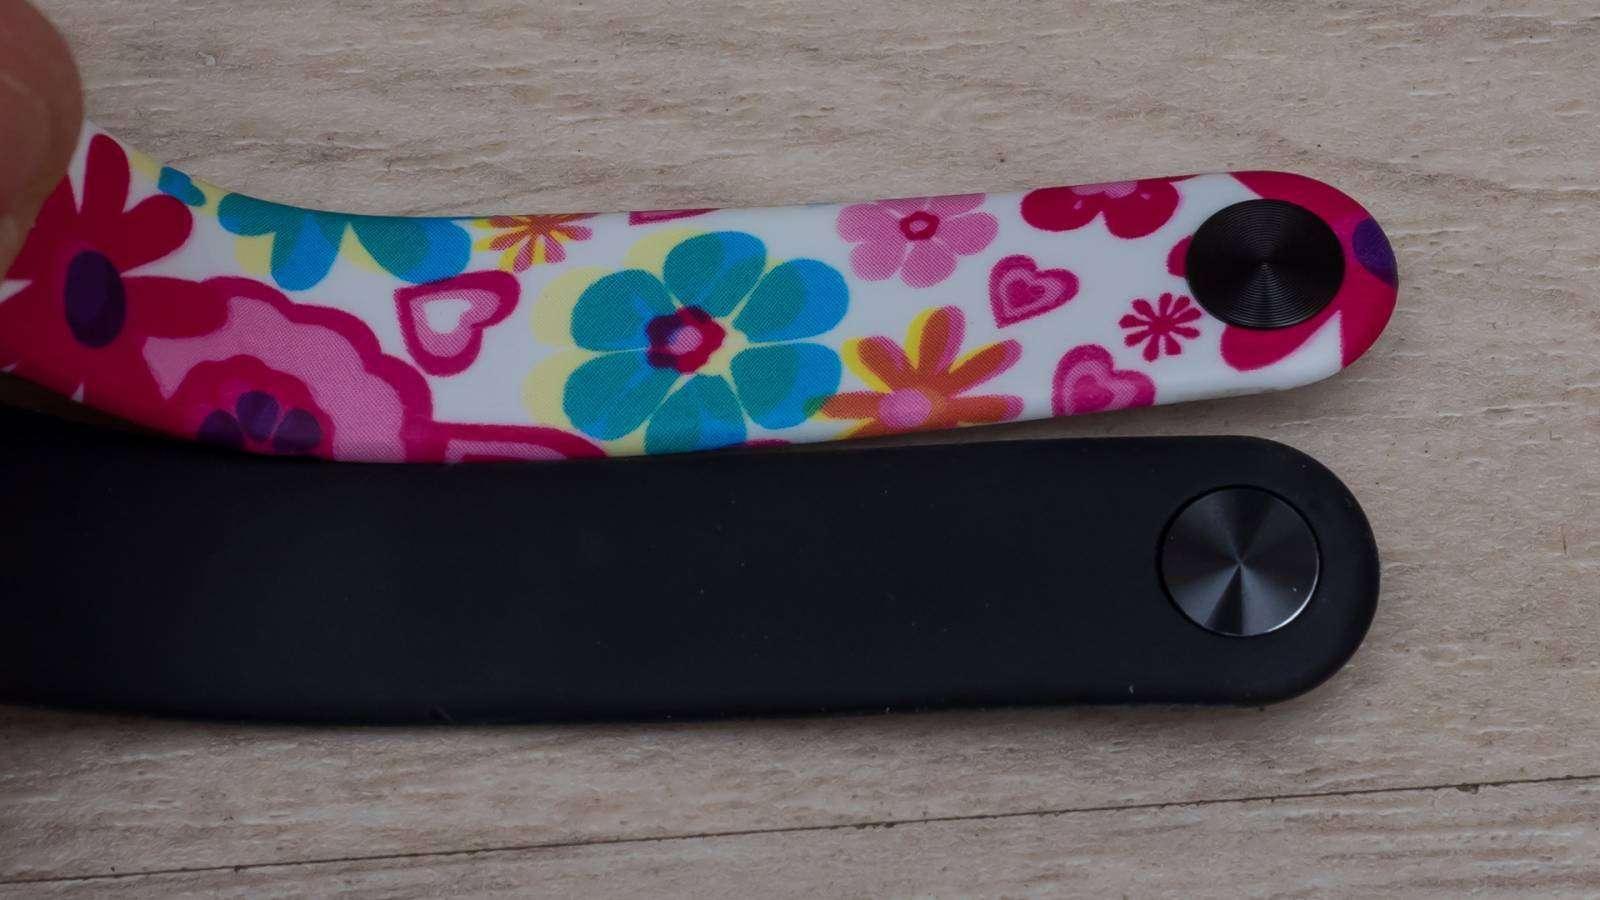 Aliexpress: Позитивный сменный ремешок для Xiaomi Mi Band 2